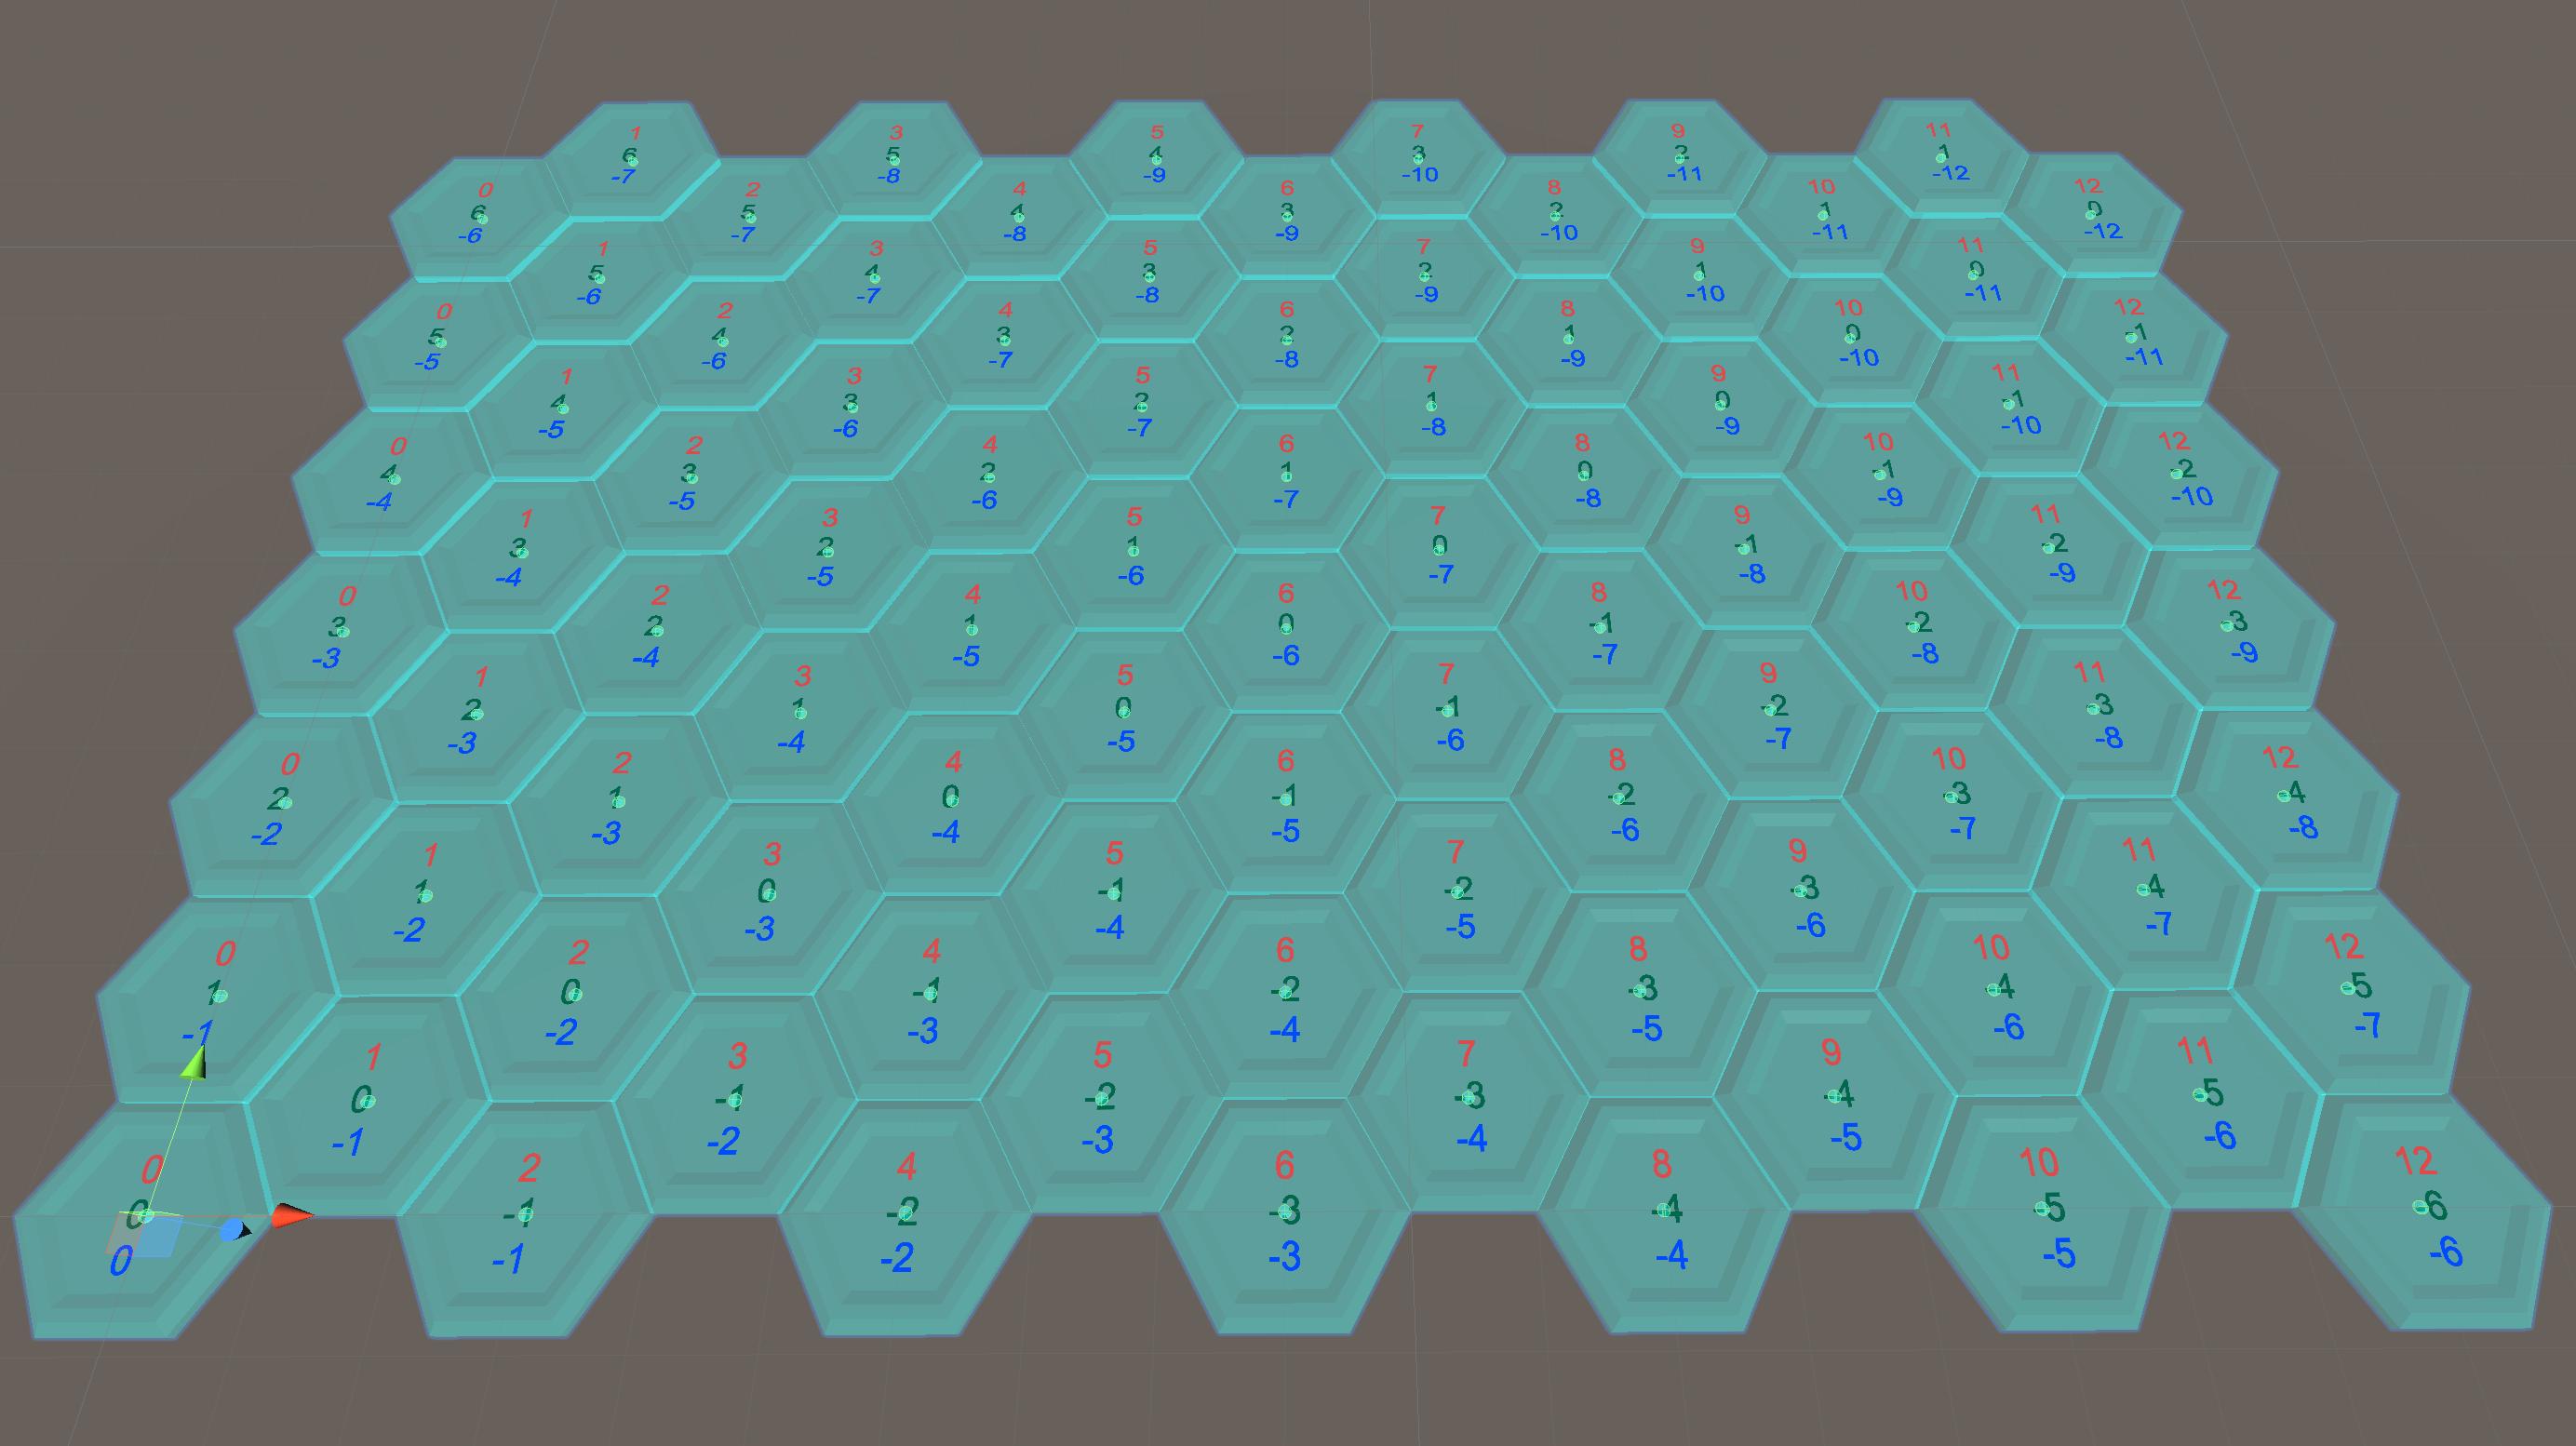 Indie Game Dev Log: 30/04/2020 (Procedural Hexagon Grid Game Board Creation) Thumbnail